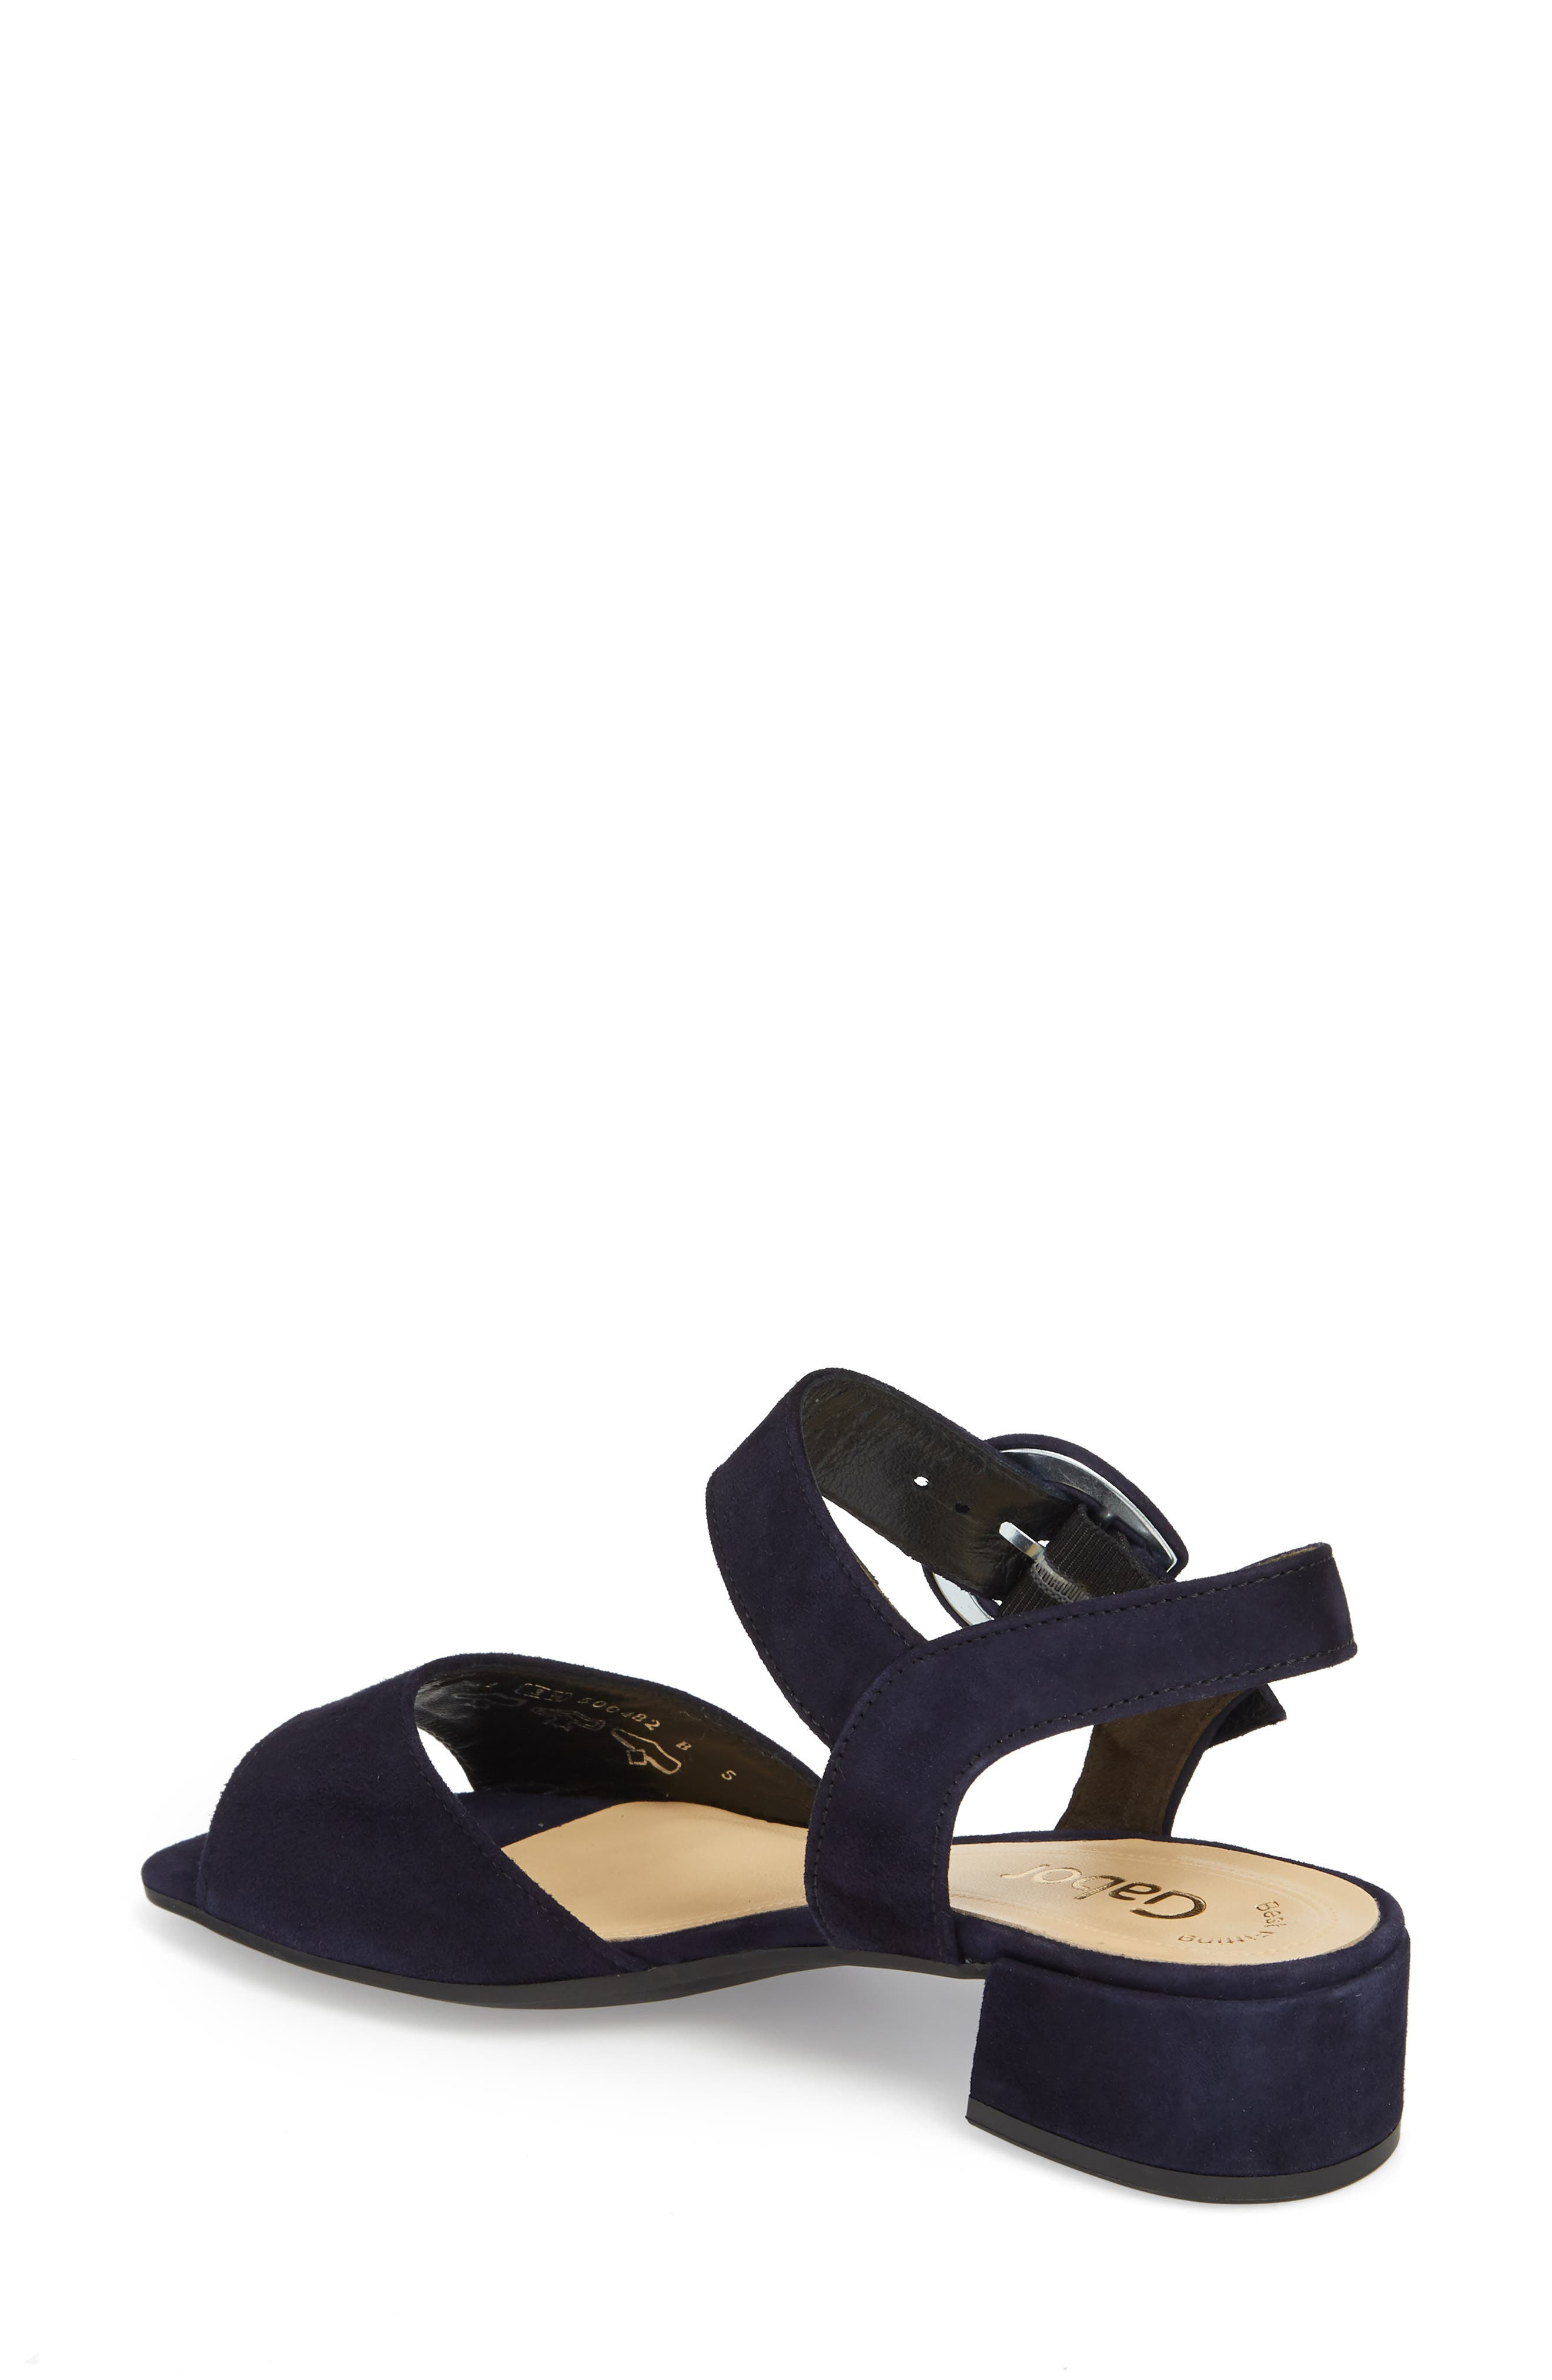 Block Heel Sandal,                             Alternate thumbnail 2, color,                             Navy Suede